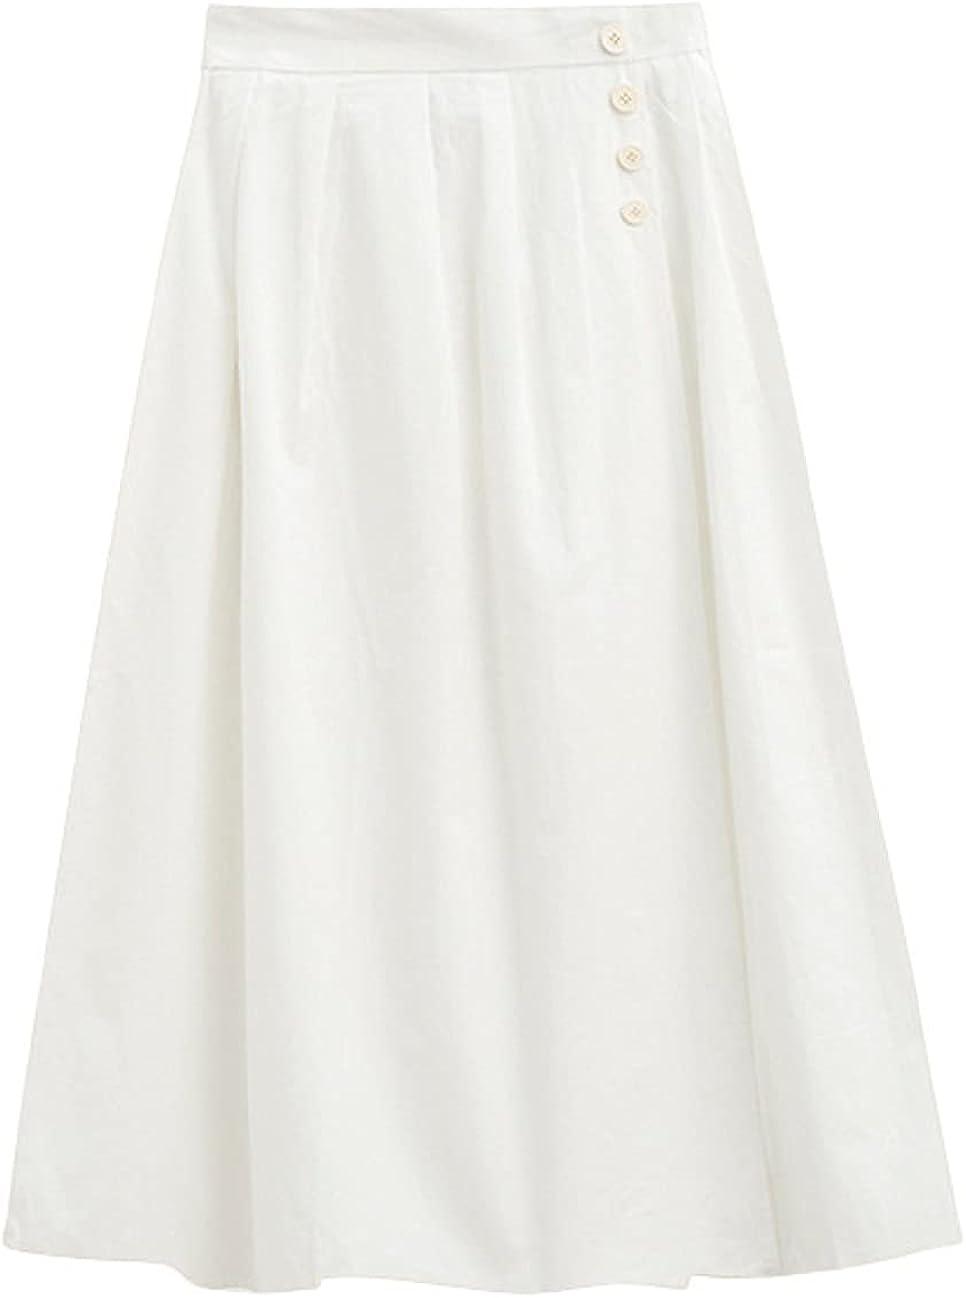 CHARTOU Women's Summer Back Elastic-Waist Flared Pleated A-Line Midi Long Skirt